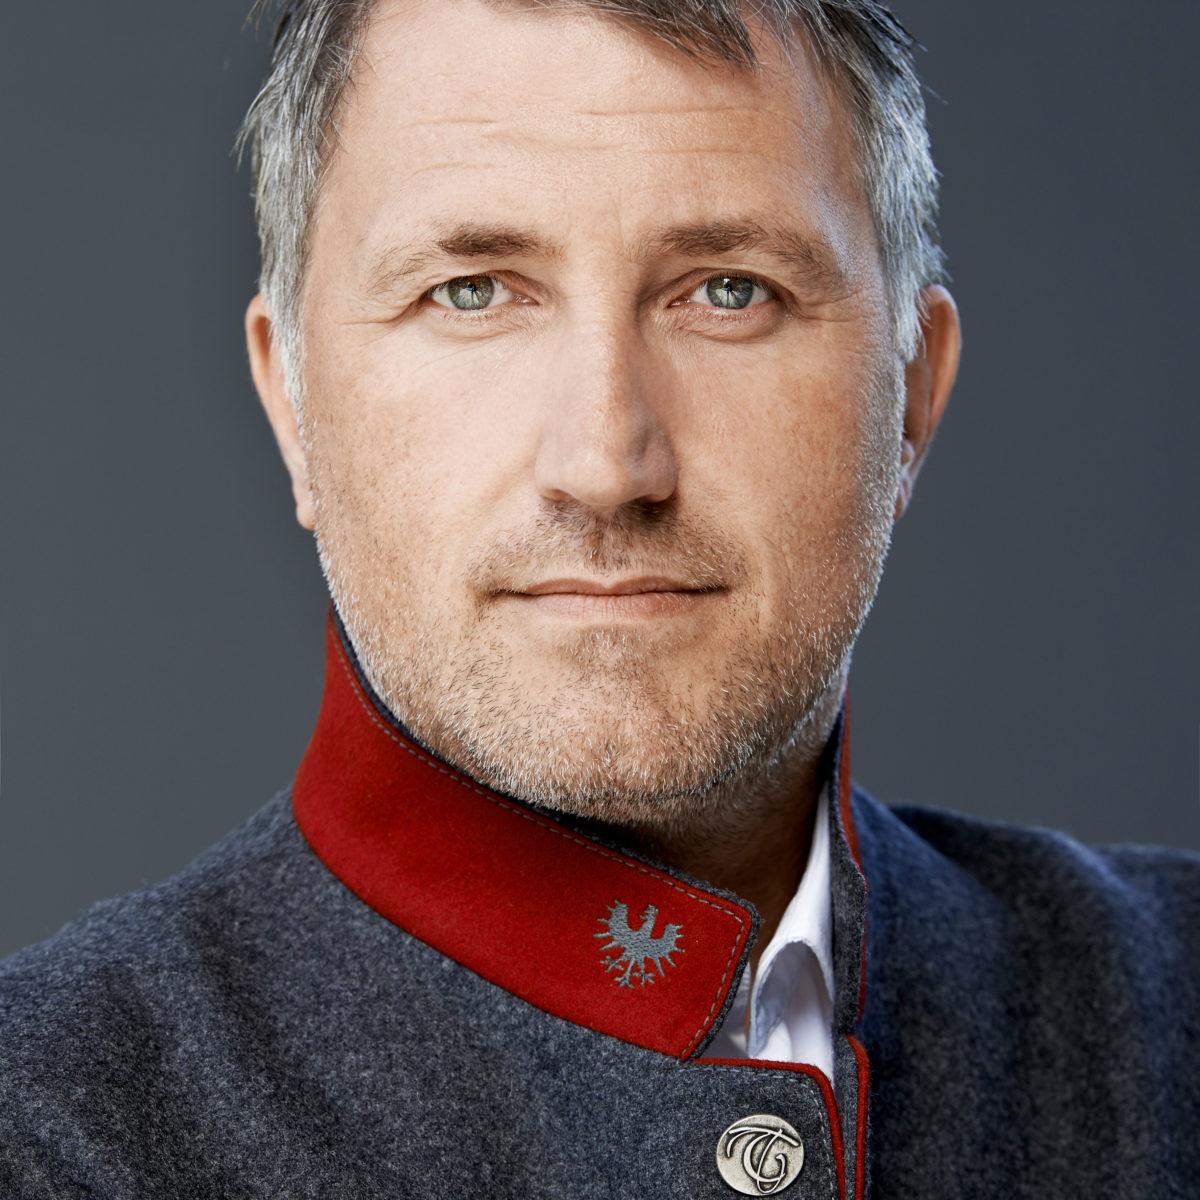 Herbert Rieser